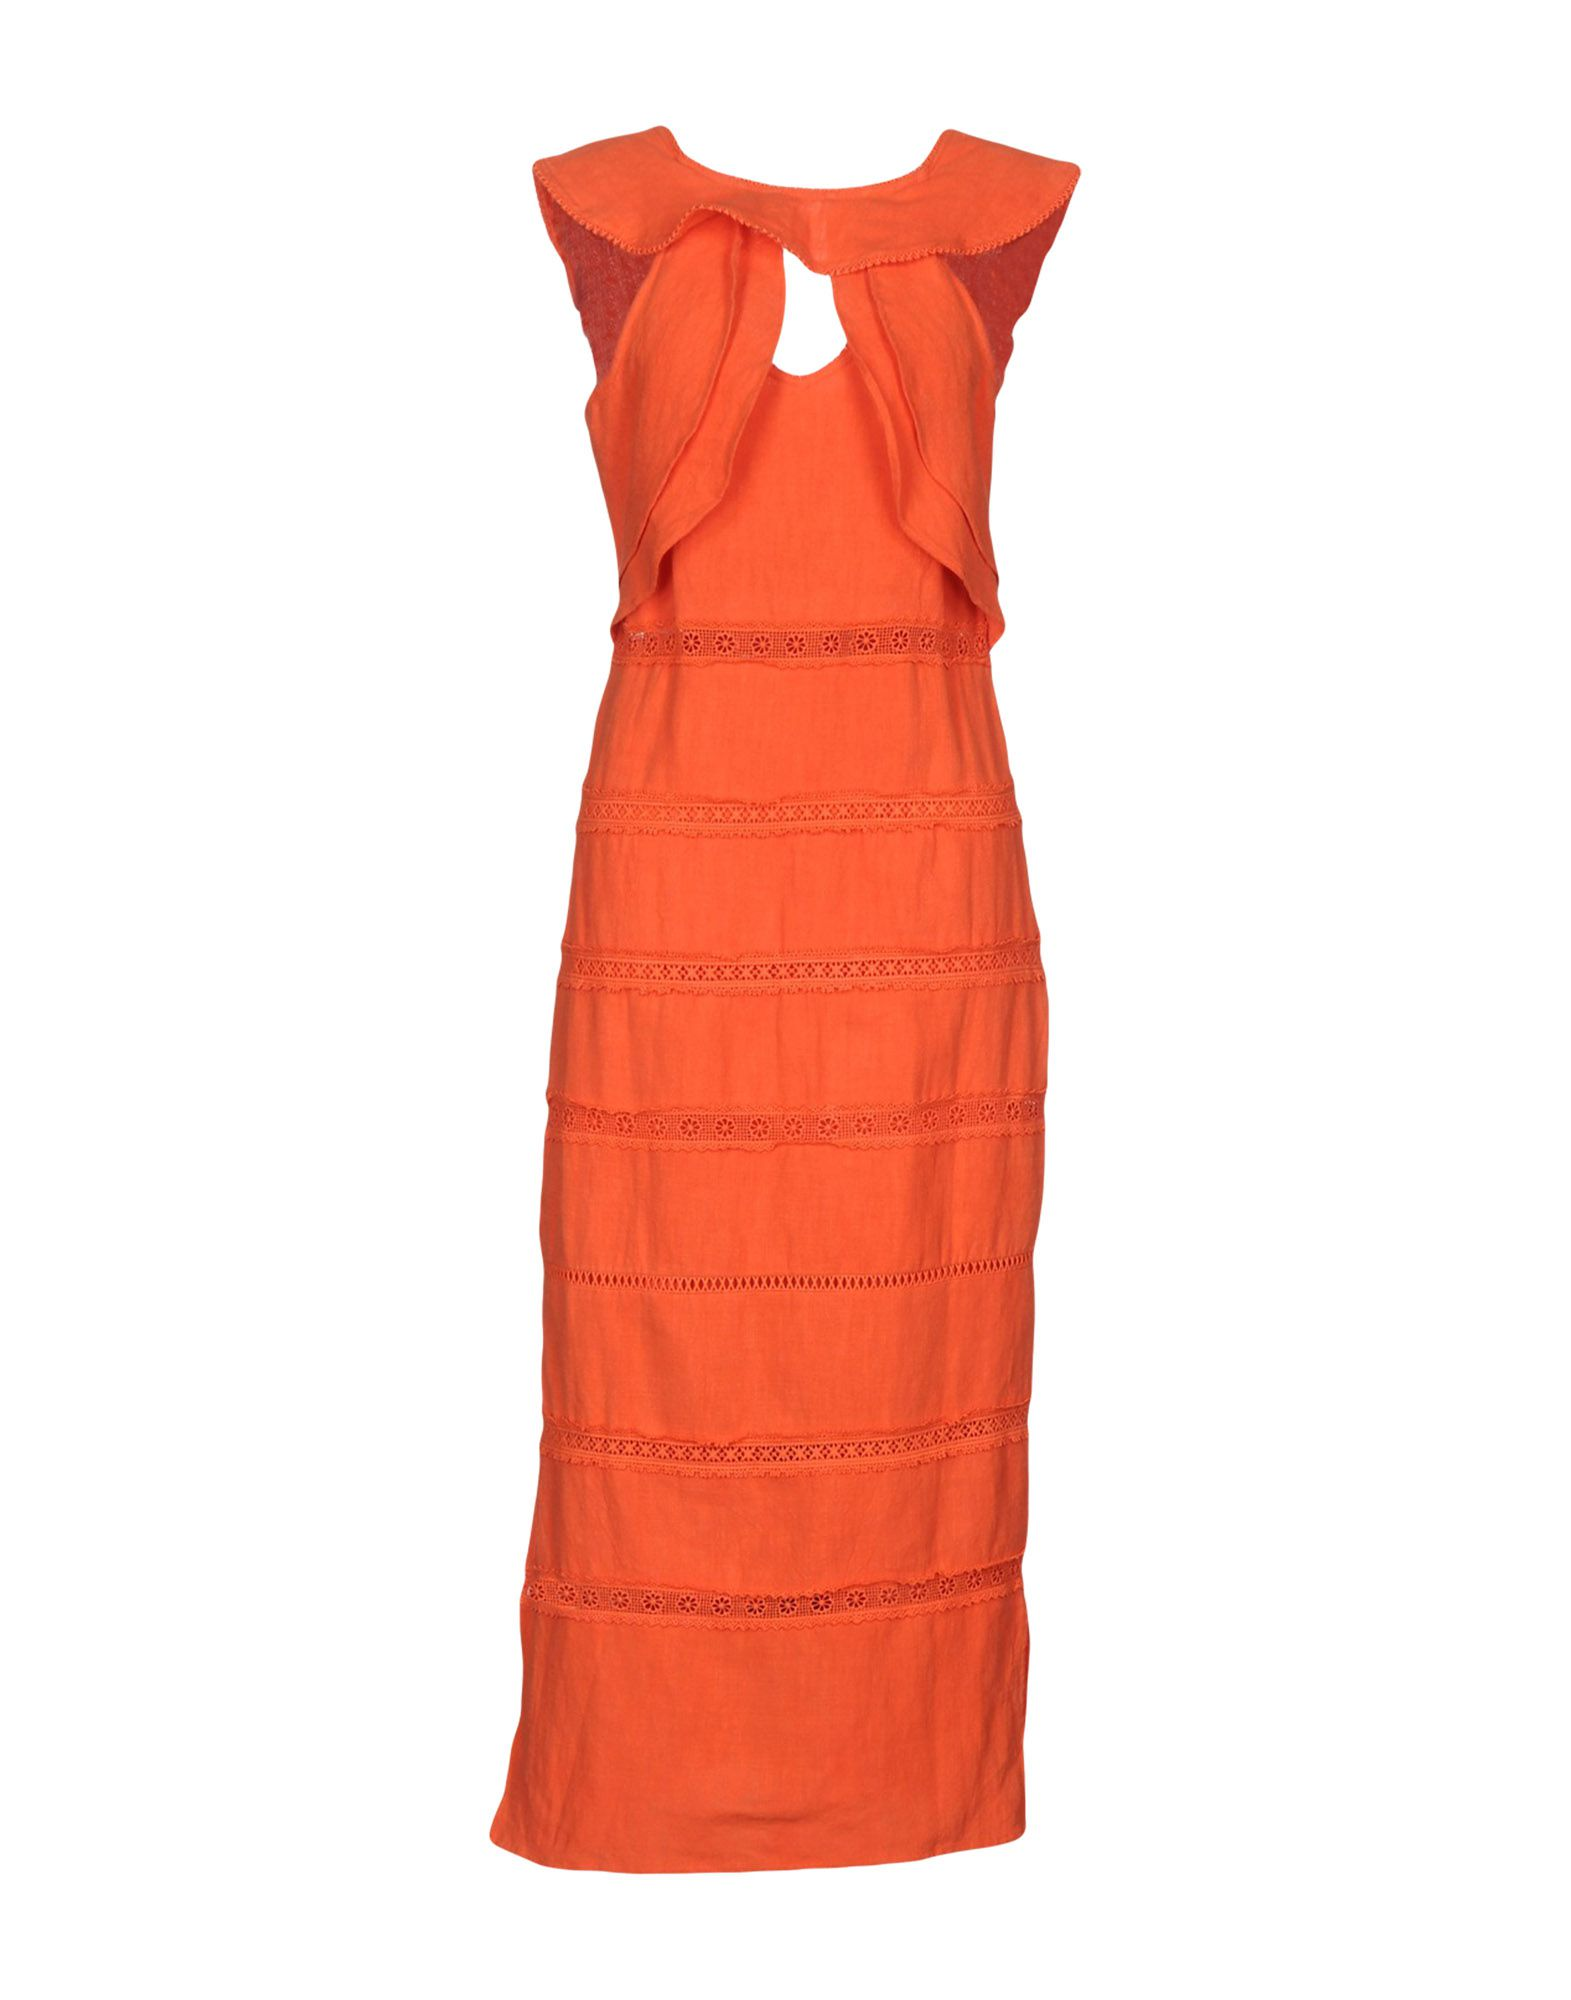 INTROPIA Damen Midikleid Farbe Koralle Größe 6 - broschei